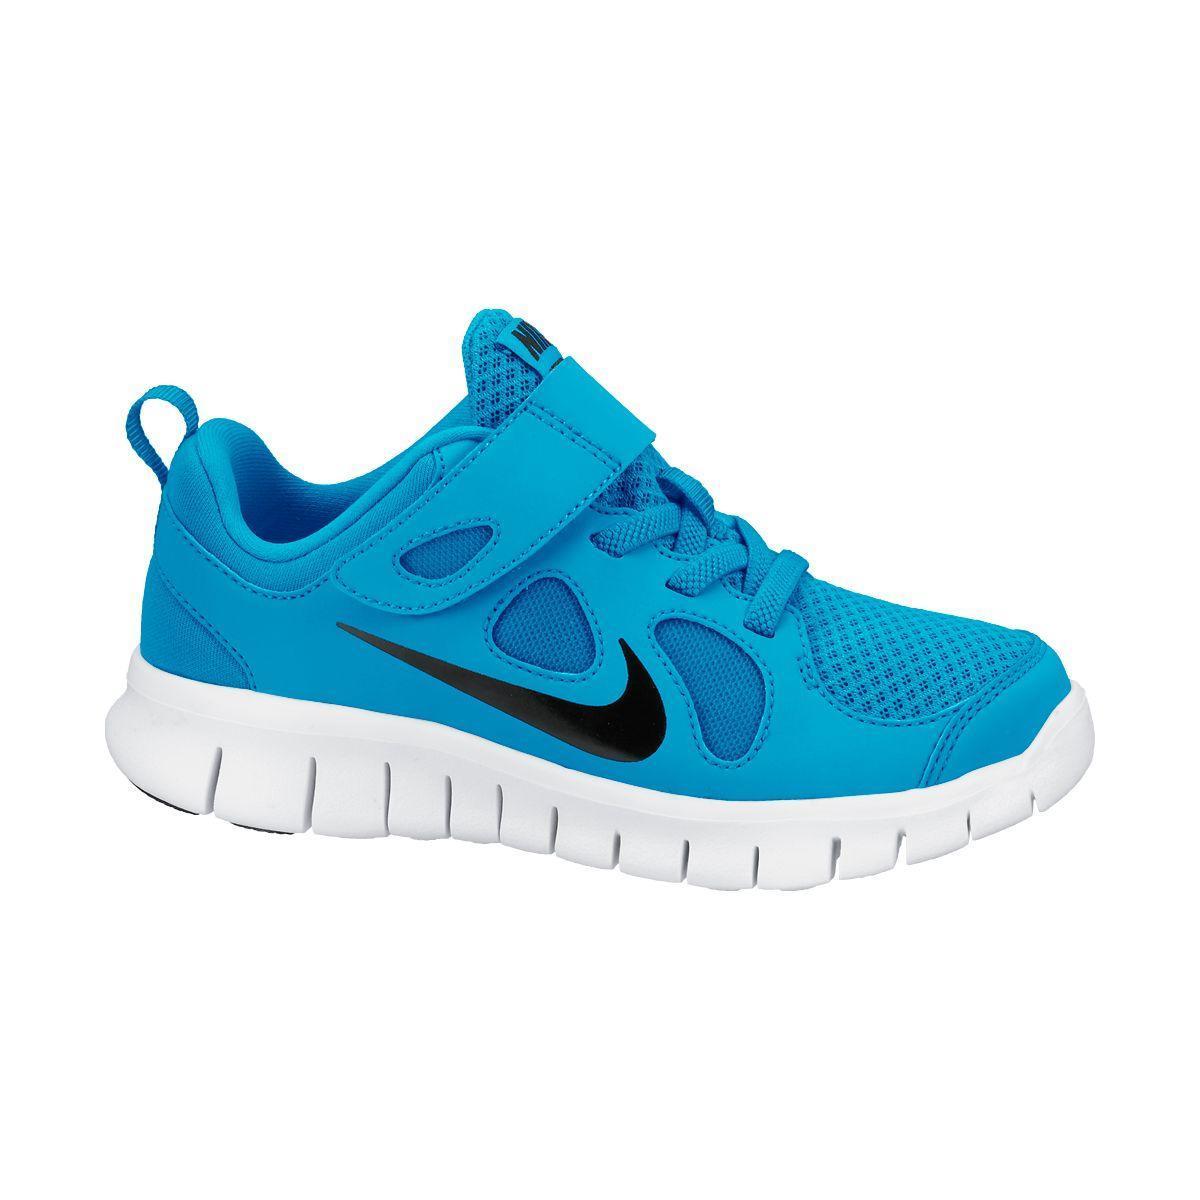 Nike Little Boys Free 5.0+ Running Shoes - Blue ...